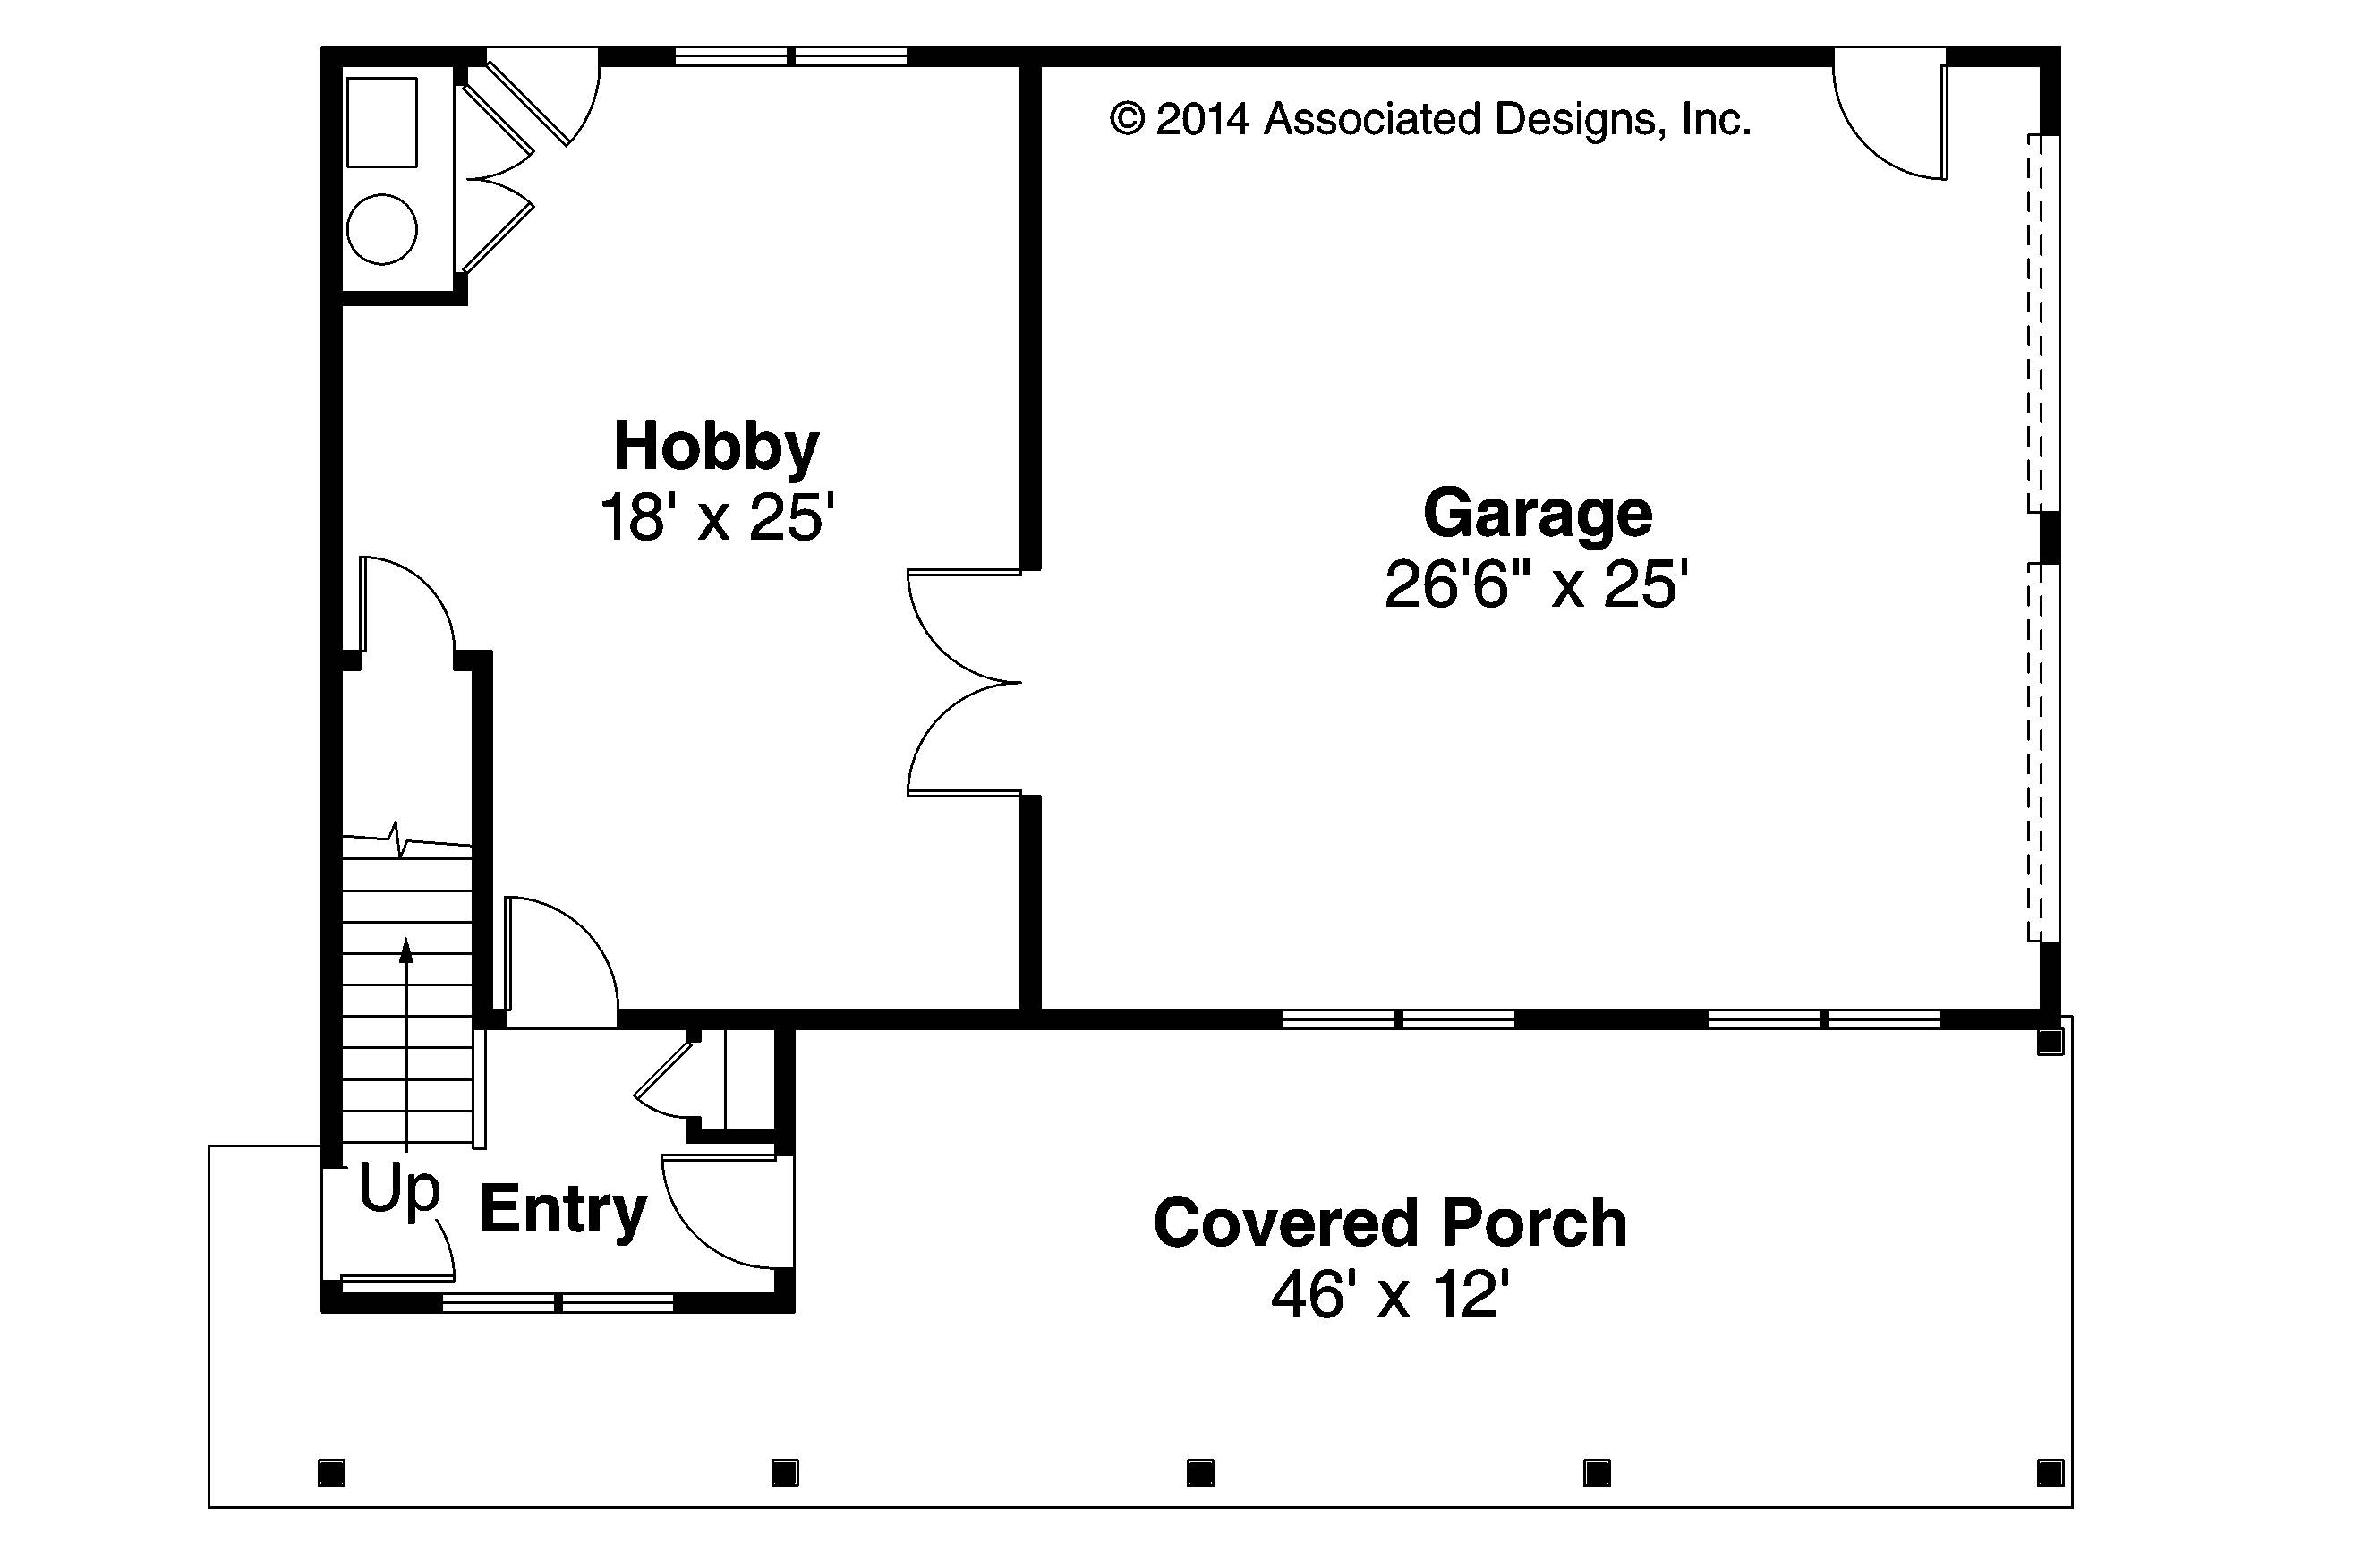 Apartment Garage Floor Plans 21 Photo Gallery House Plans